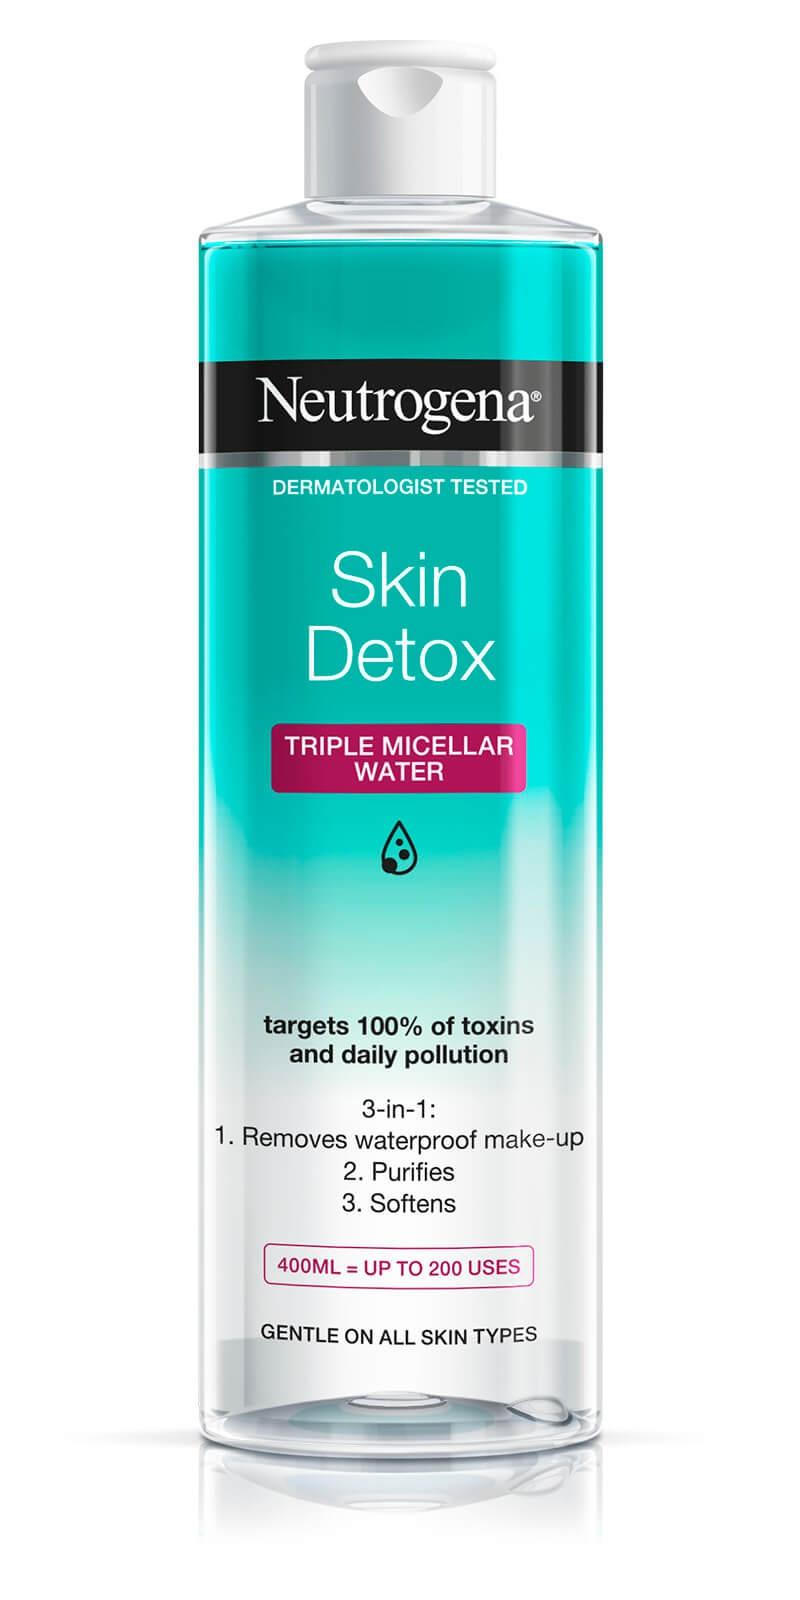 Neutrogena Skin Detox Triple Micellar Water